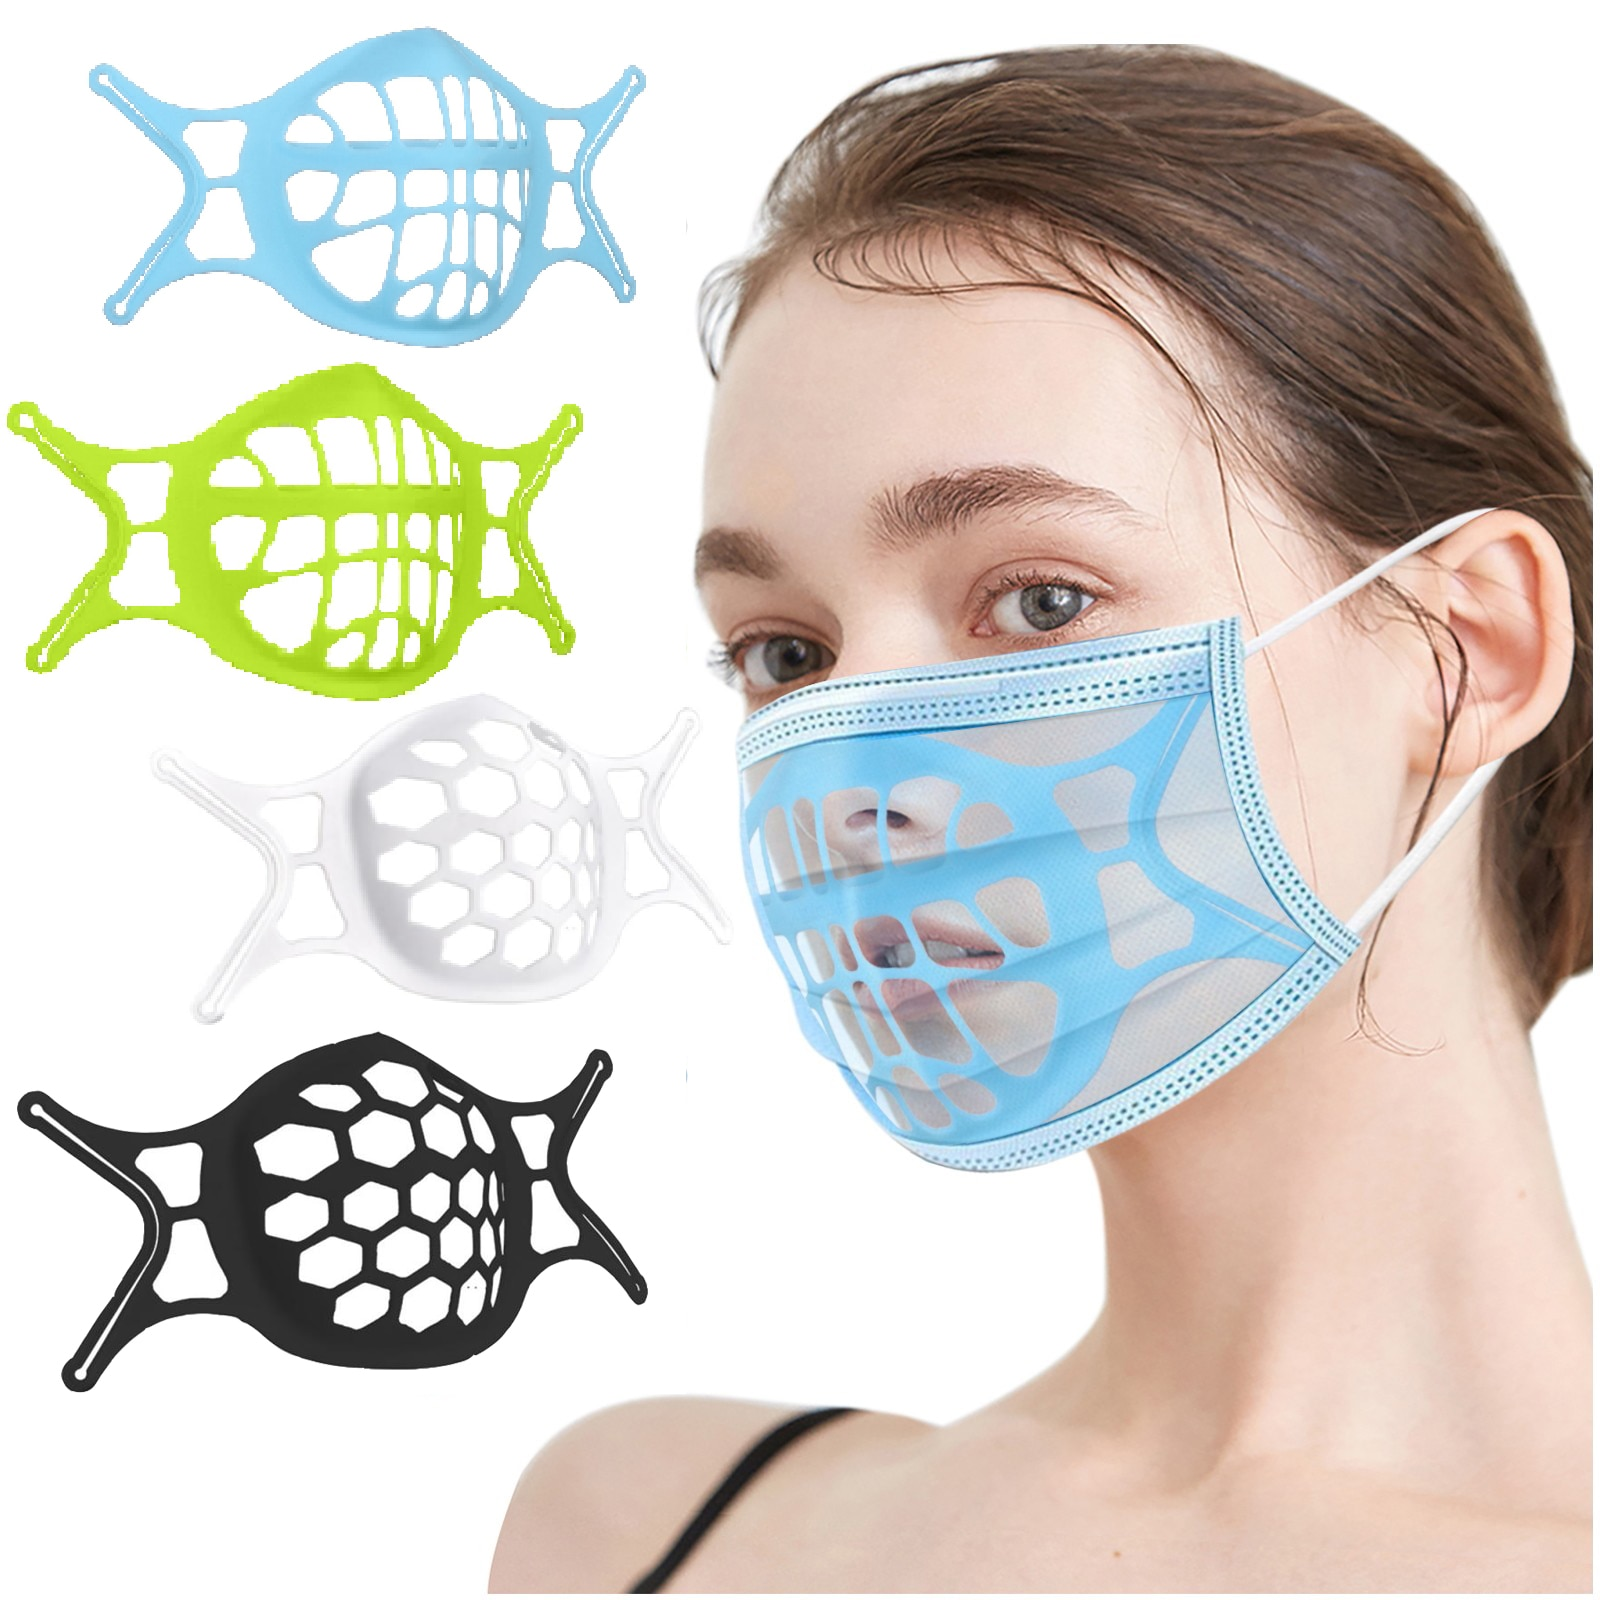 30PCS 3D Mask Bracket Breathing Assist Help Inner Cushion Bracket Silicone Reusable Washable Mask Holder Support Face Skin Care